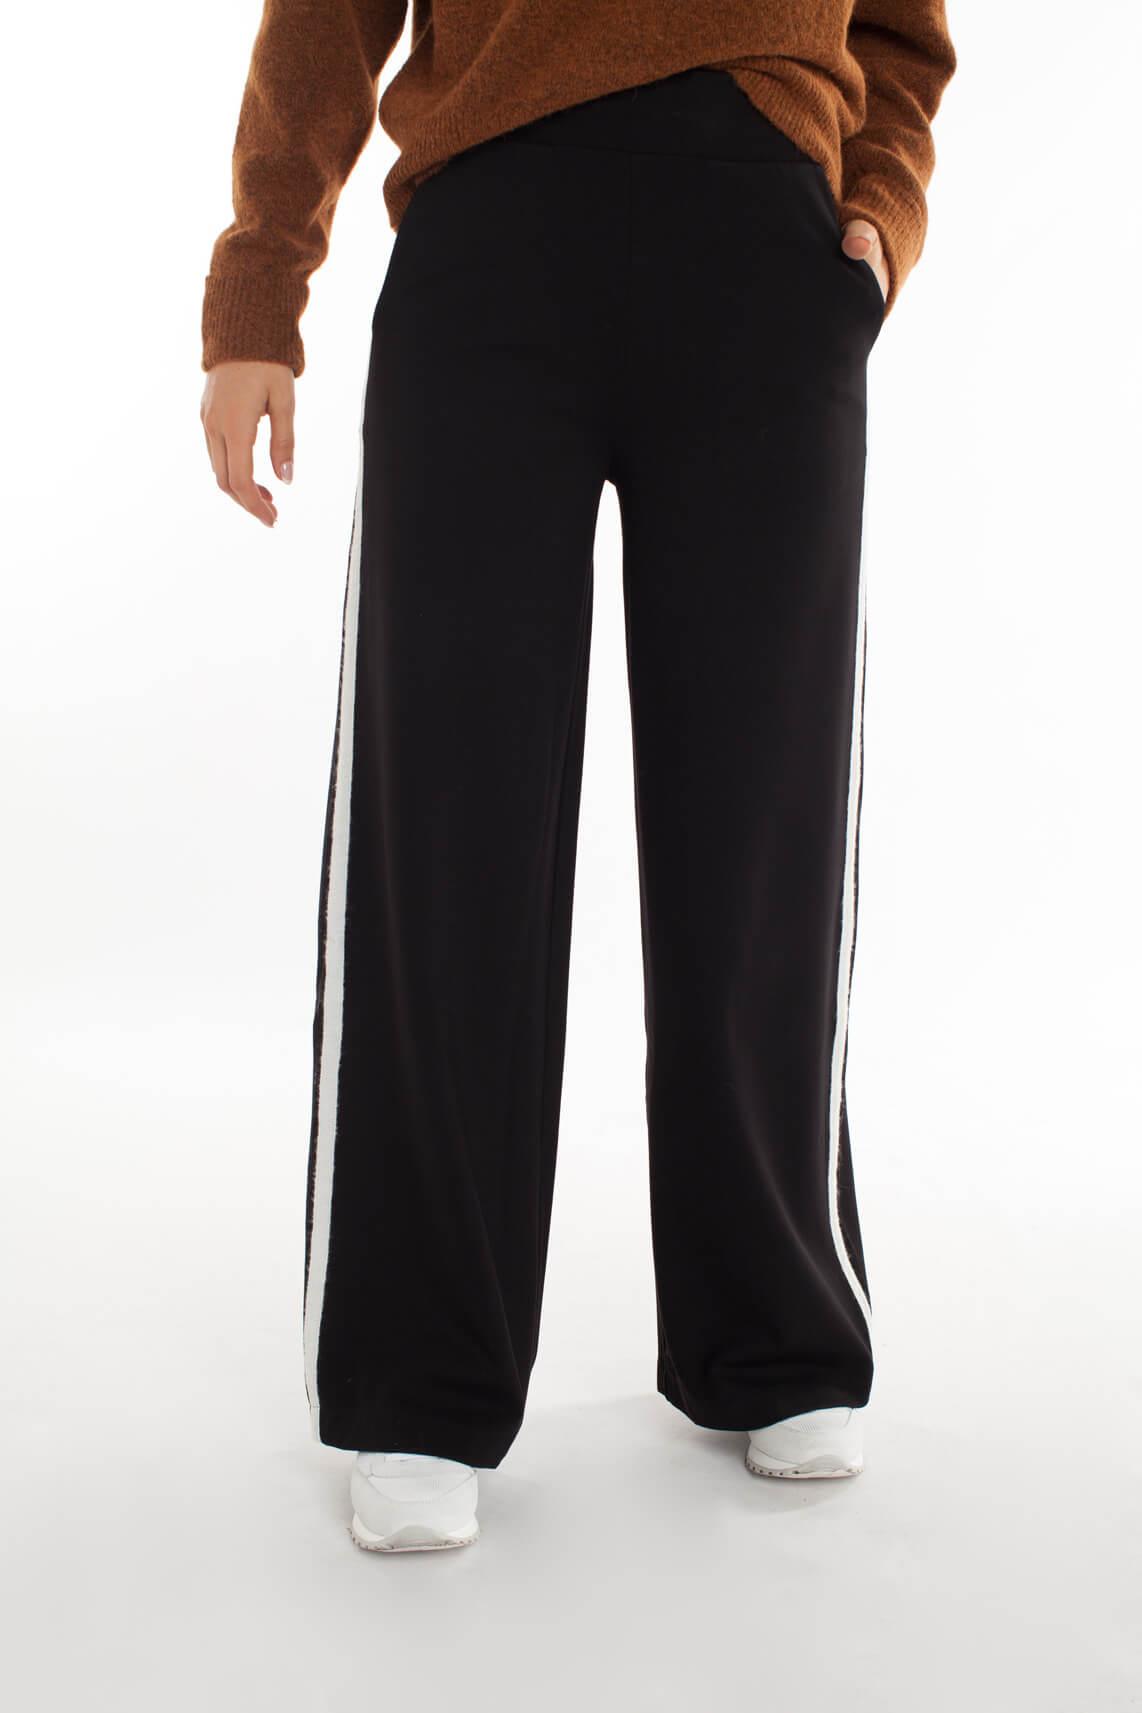 10 Days Dames Wijdvallende jogpantalon zwart